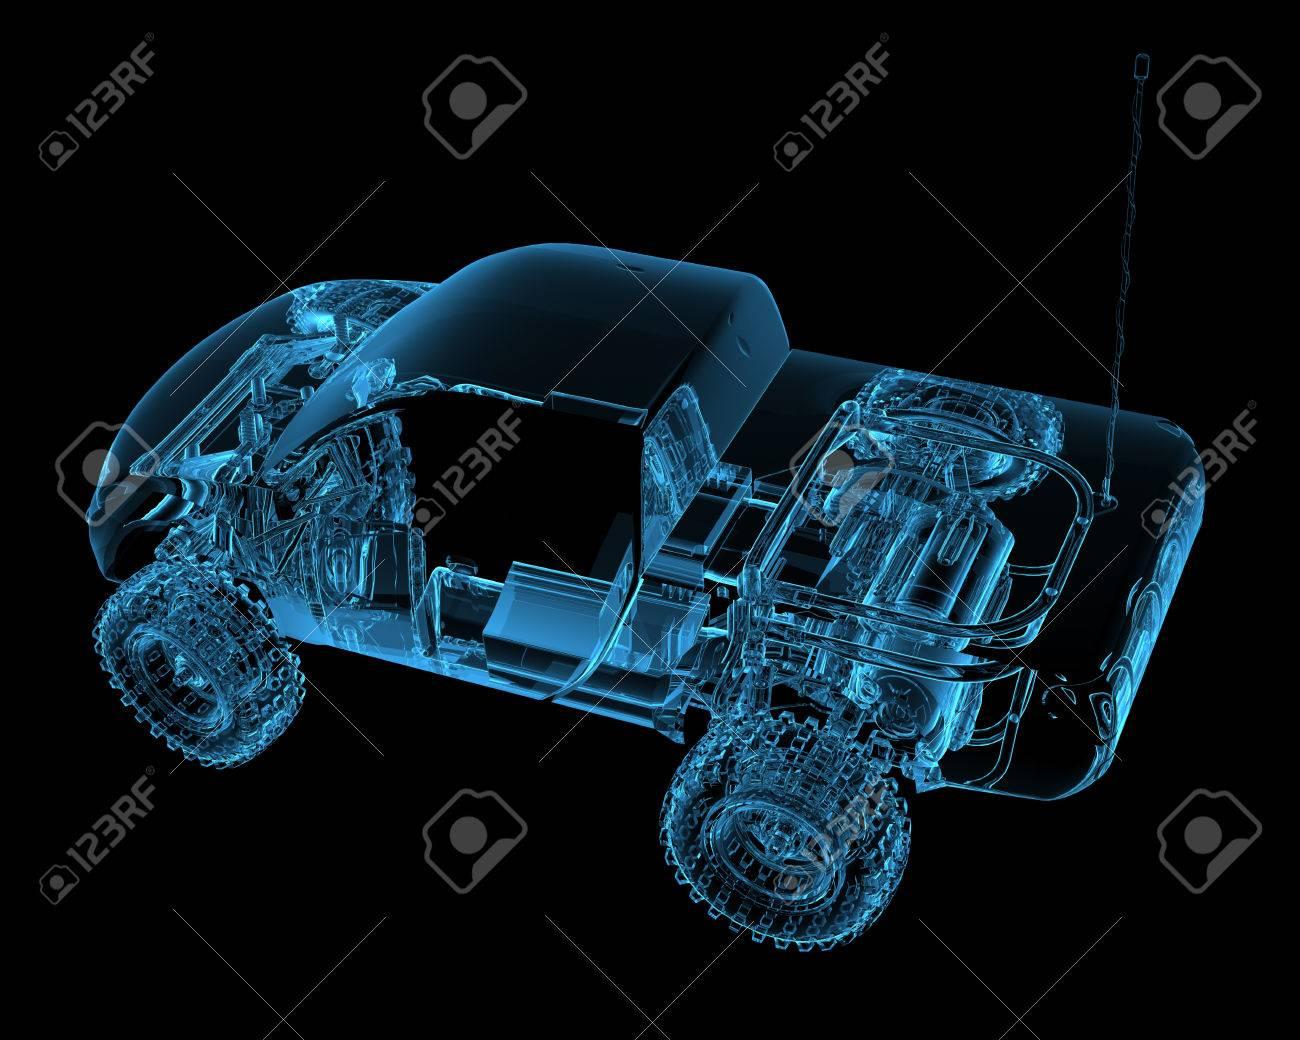 Ferngesteuerte RC Spielzeugauto 3D-Röntgenstrahl Blau Transparent ...